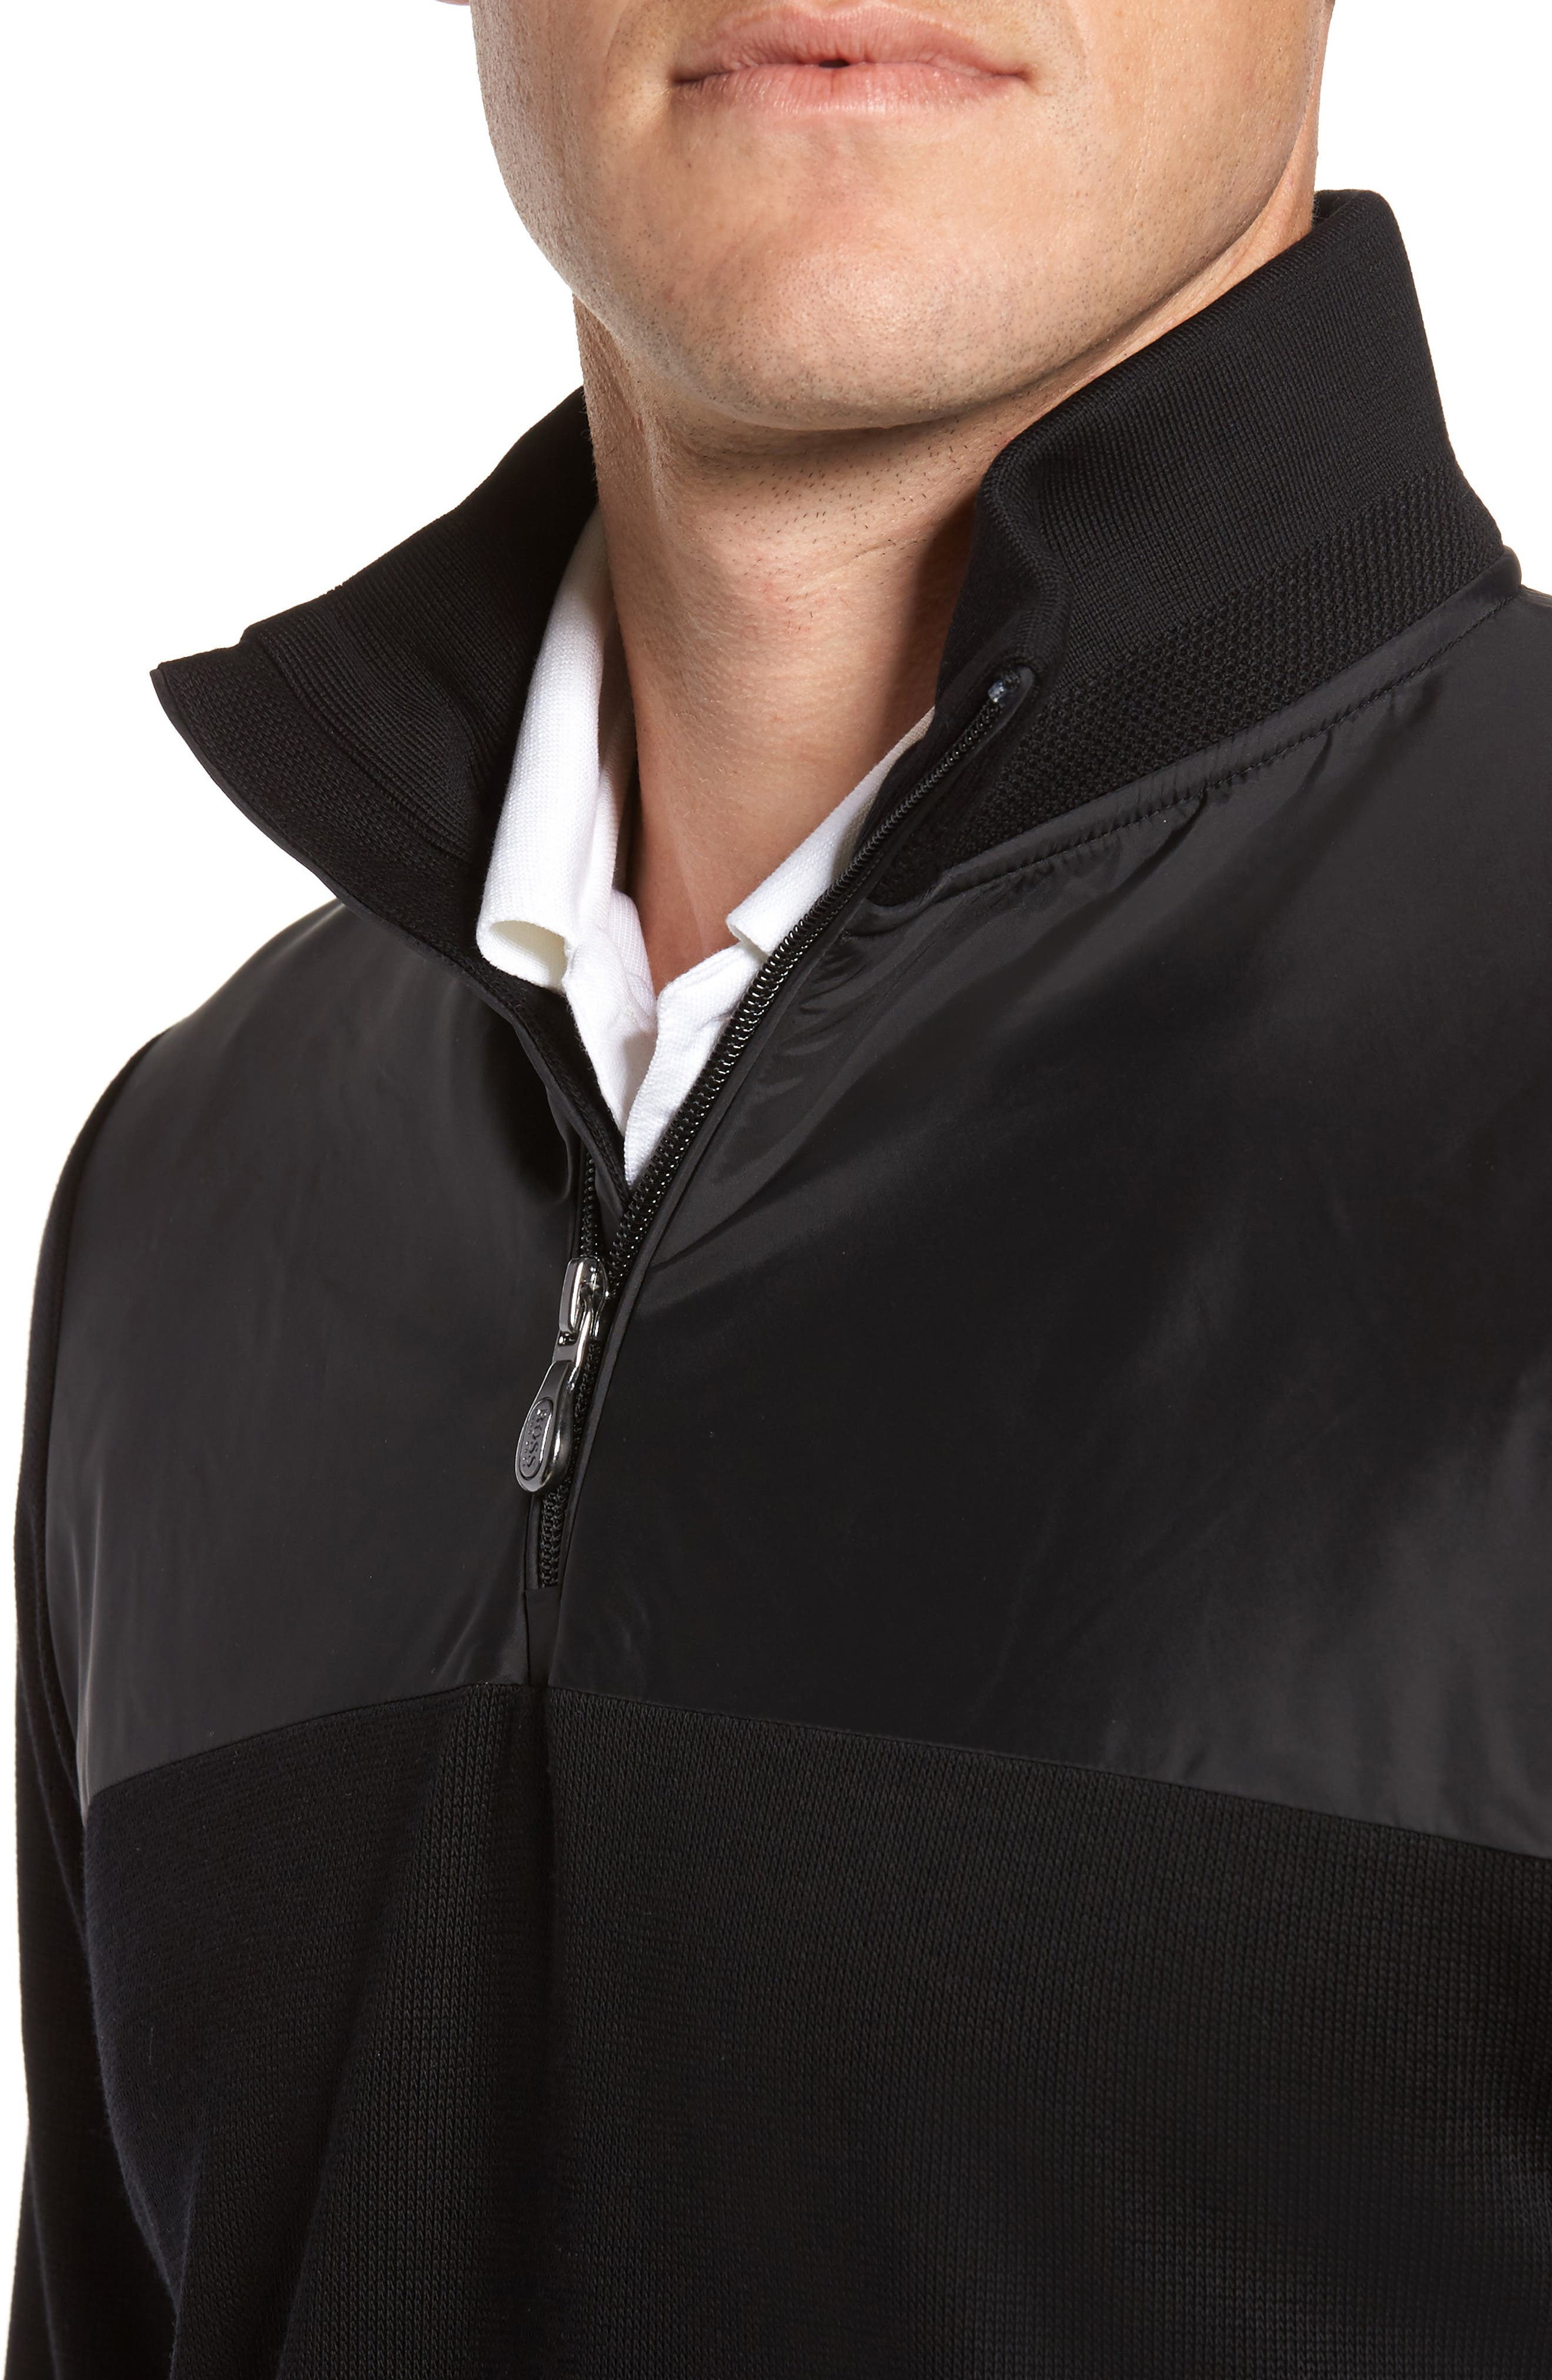 C-Piceno Quarter Zip Fleece Pullover,                             Alternate thumbnail 4, color,                             Black